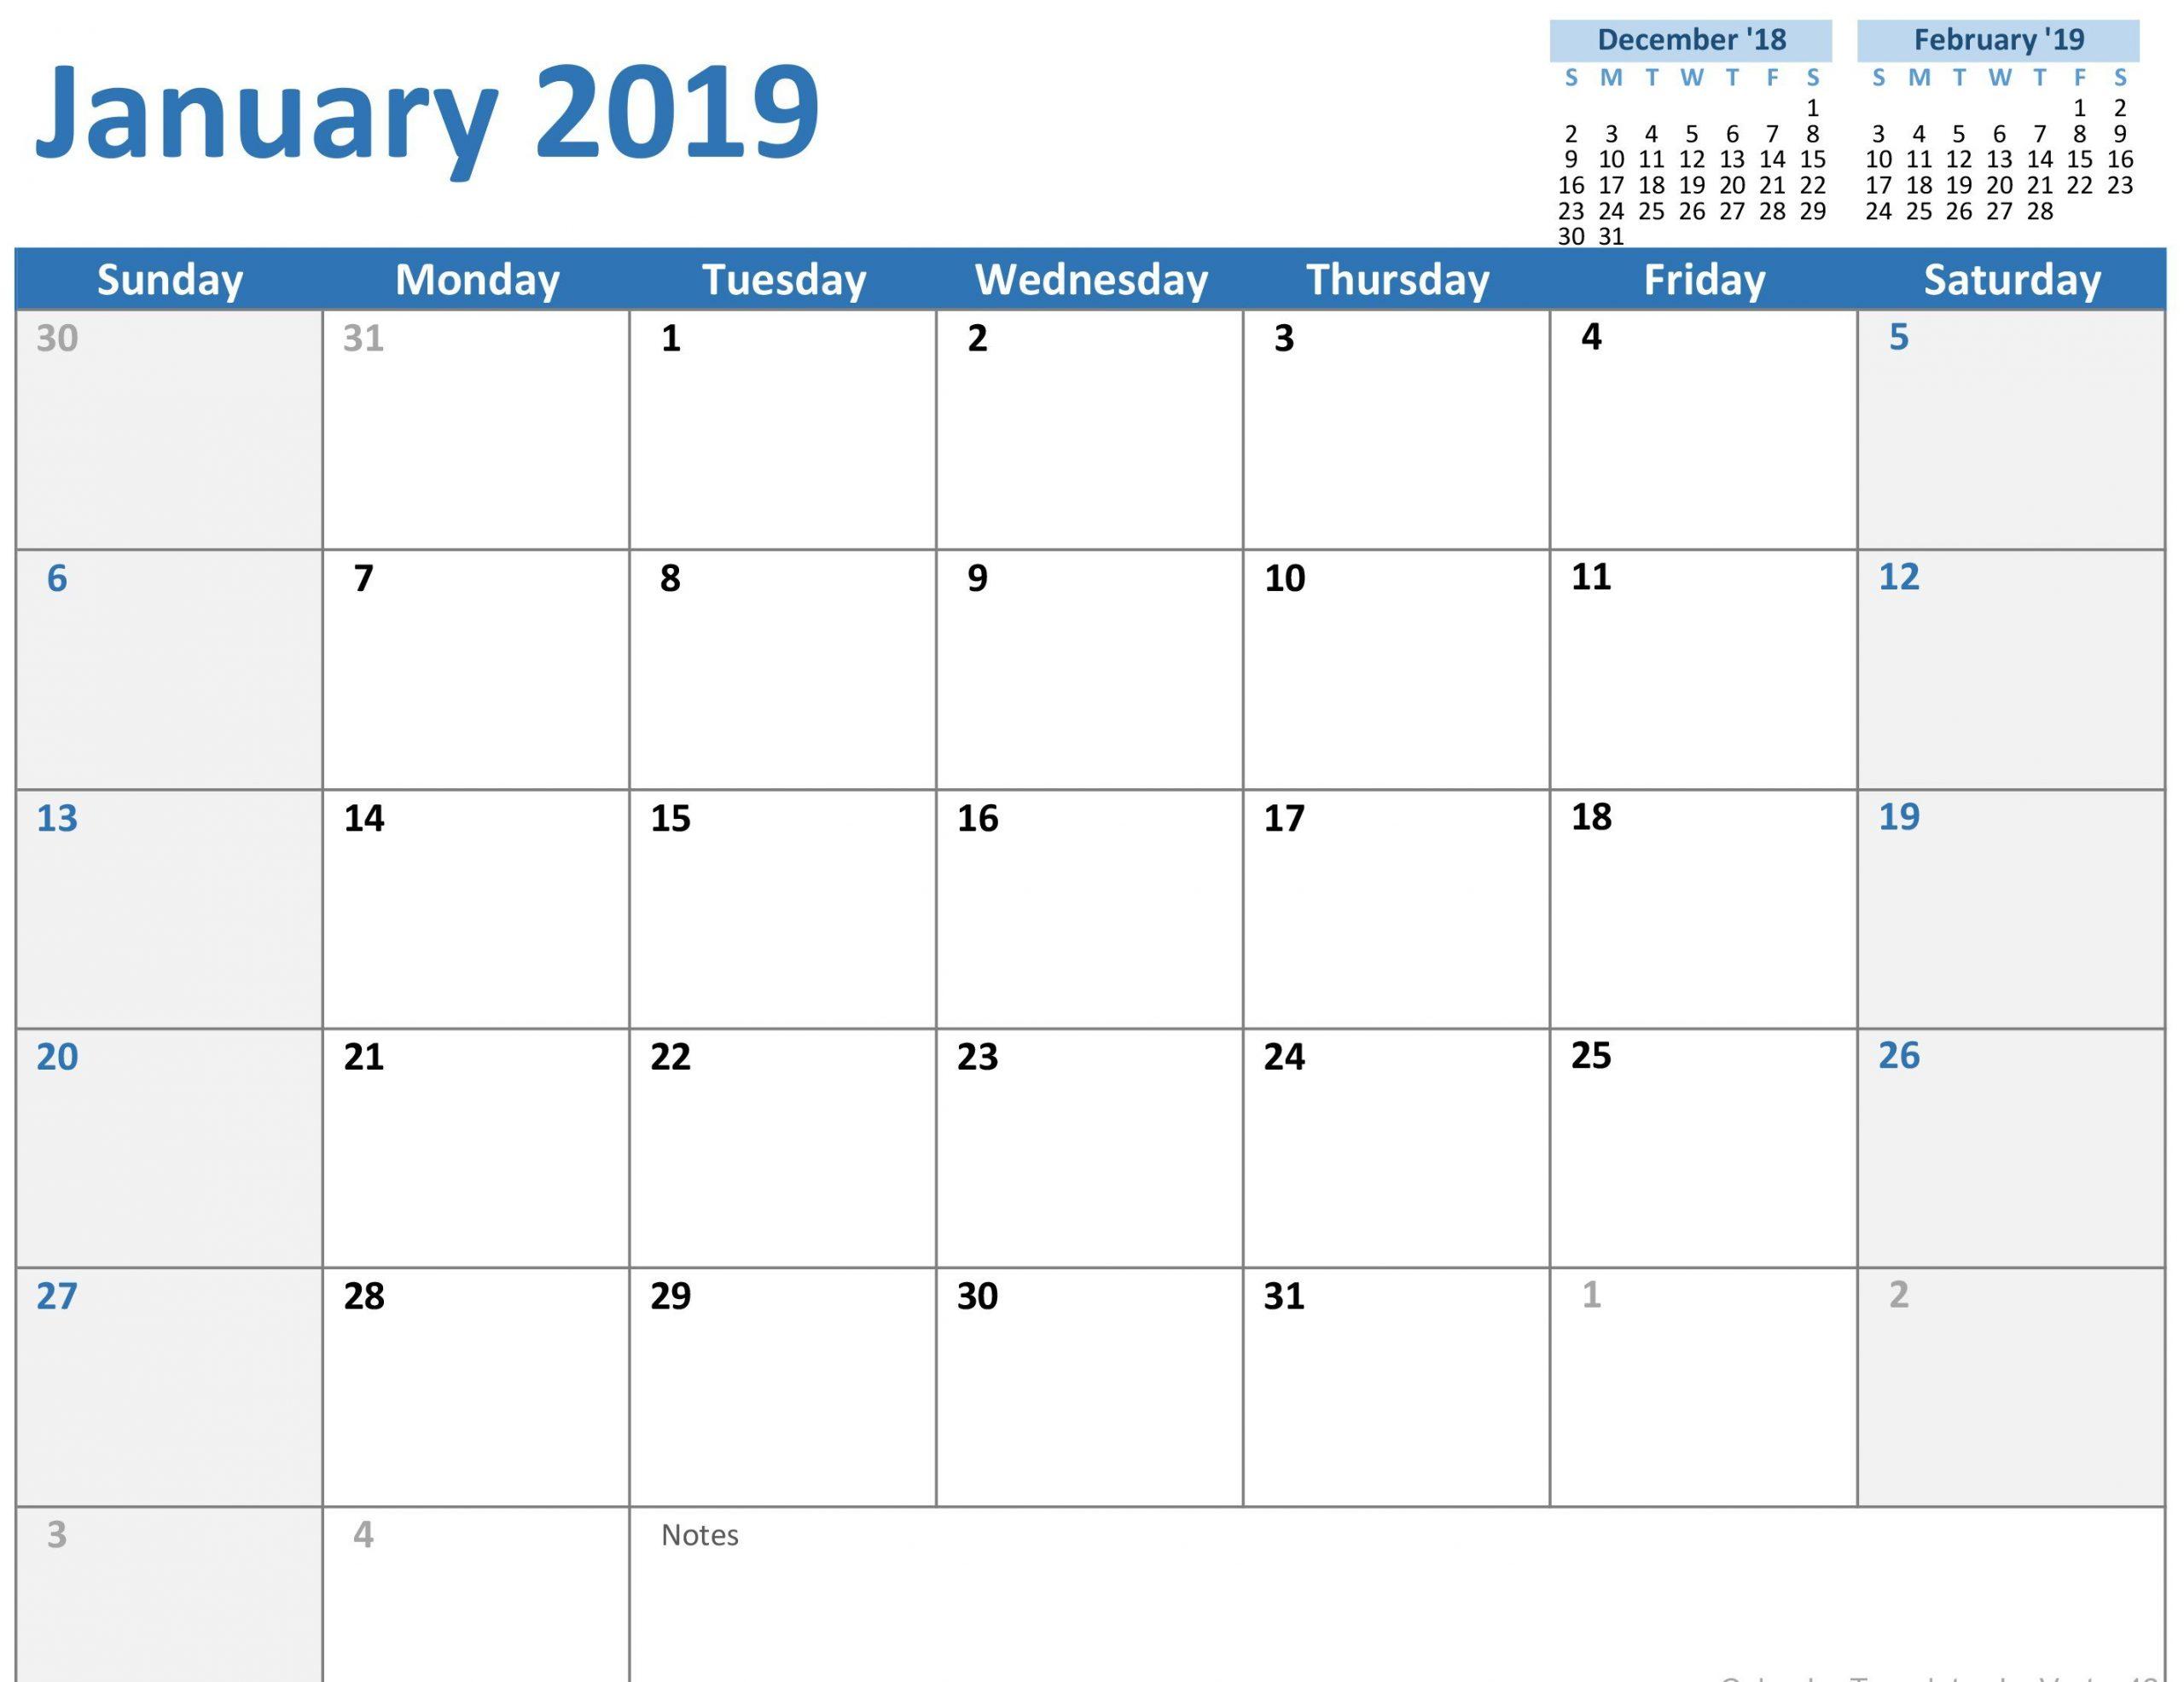 2020 Calender I Can Edit | Calendar Template Printable Free Calendars That I Can Edit And Print